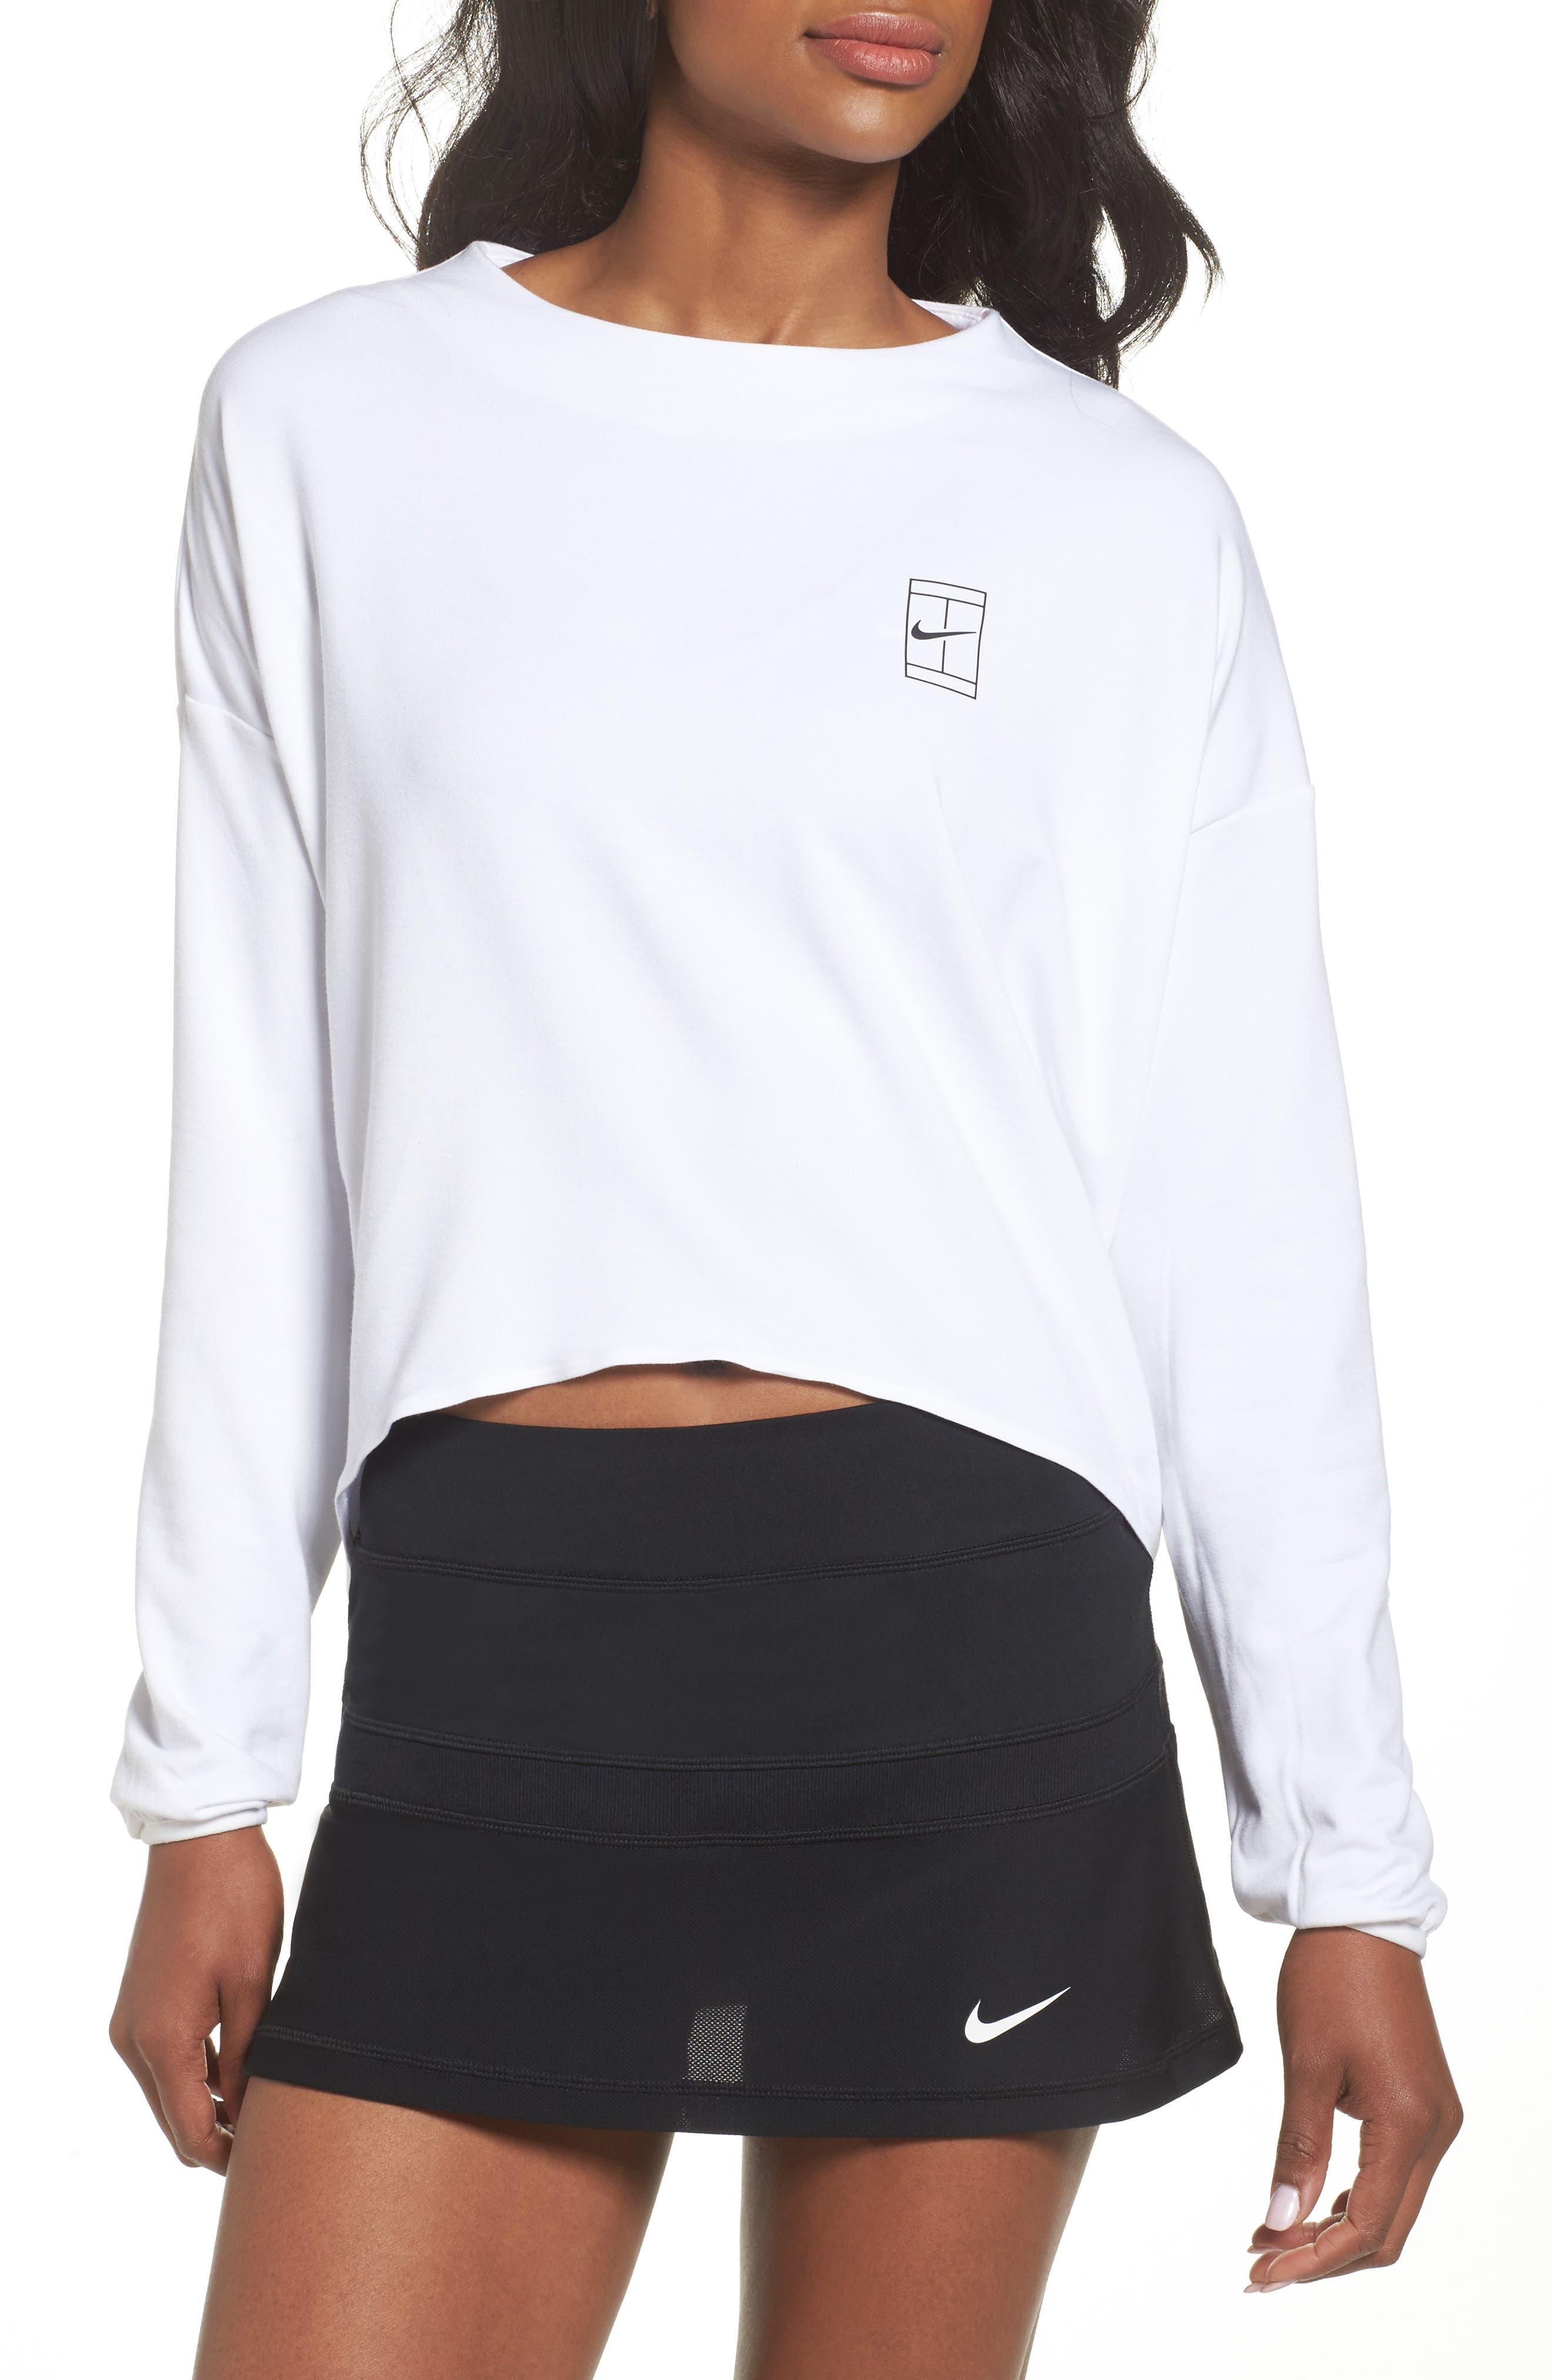 Court Dri-FIT Long Sleeve Tennis Top,                         Main,                         color, White/ White/ Black